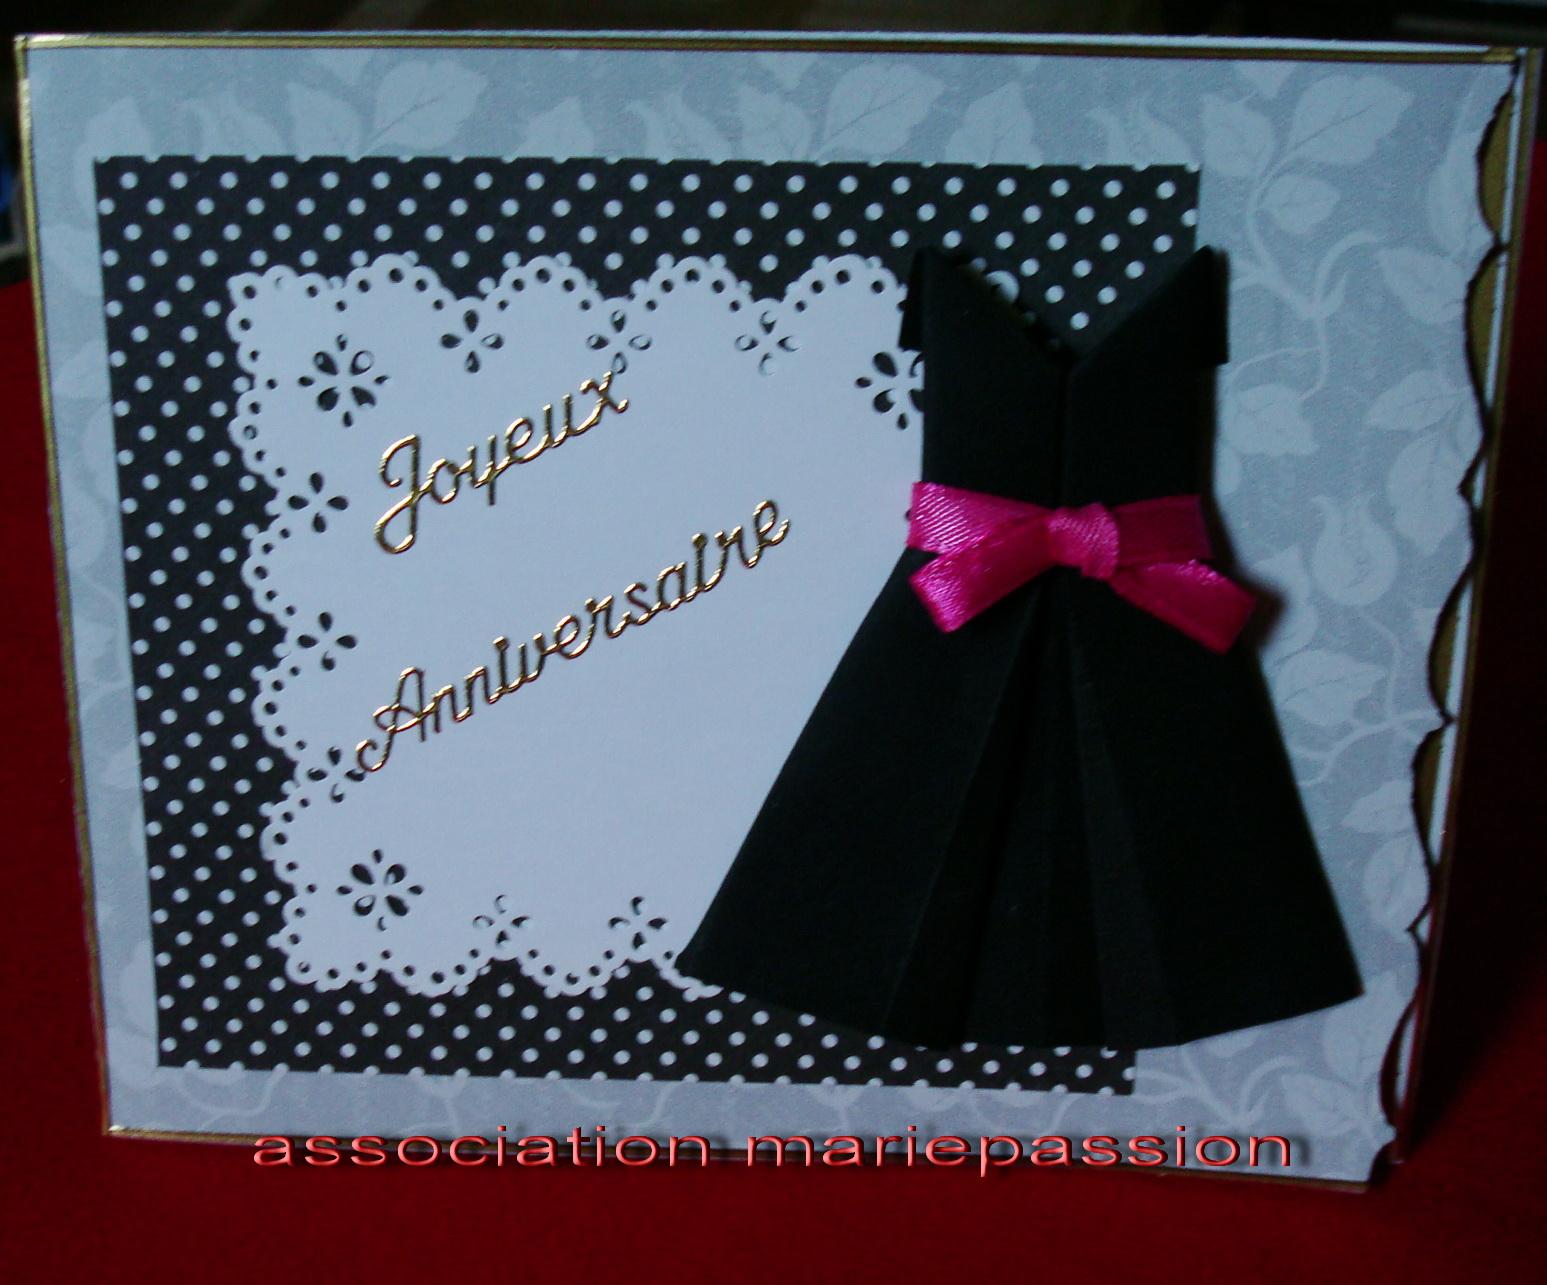 Association mariepassion une petite robe noire en origami - Robe en origami ...